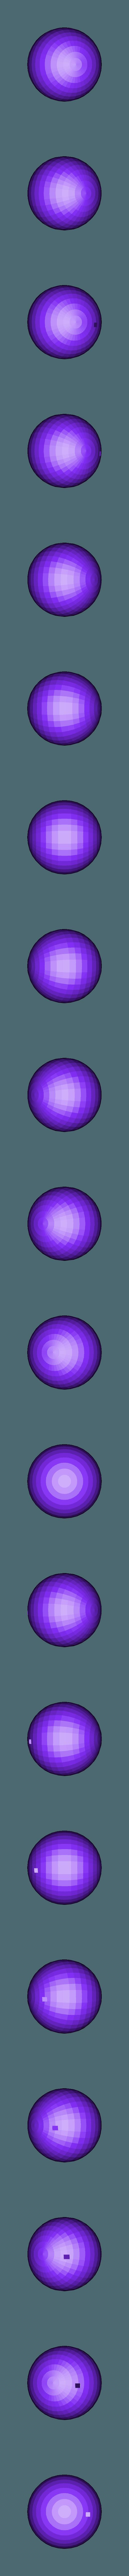 Spirit_bomb.stl Download free STL file Goku Spirit Bomb • Design to 3D print, Kiwi3D